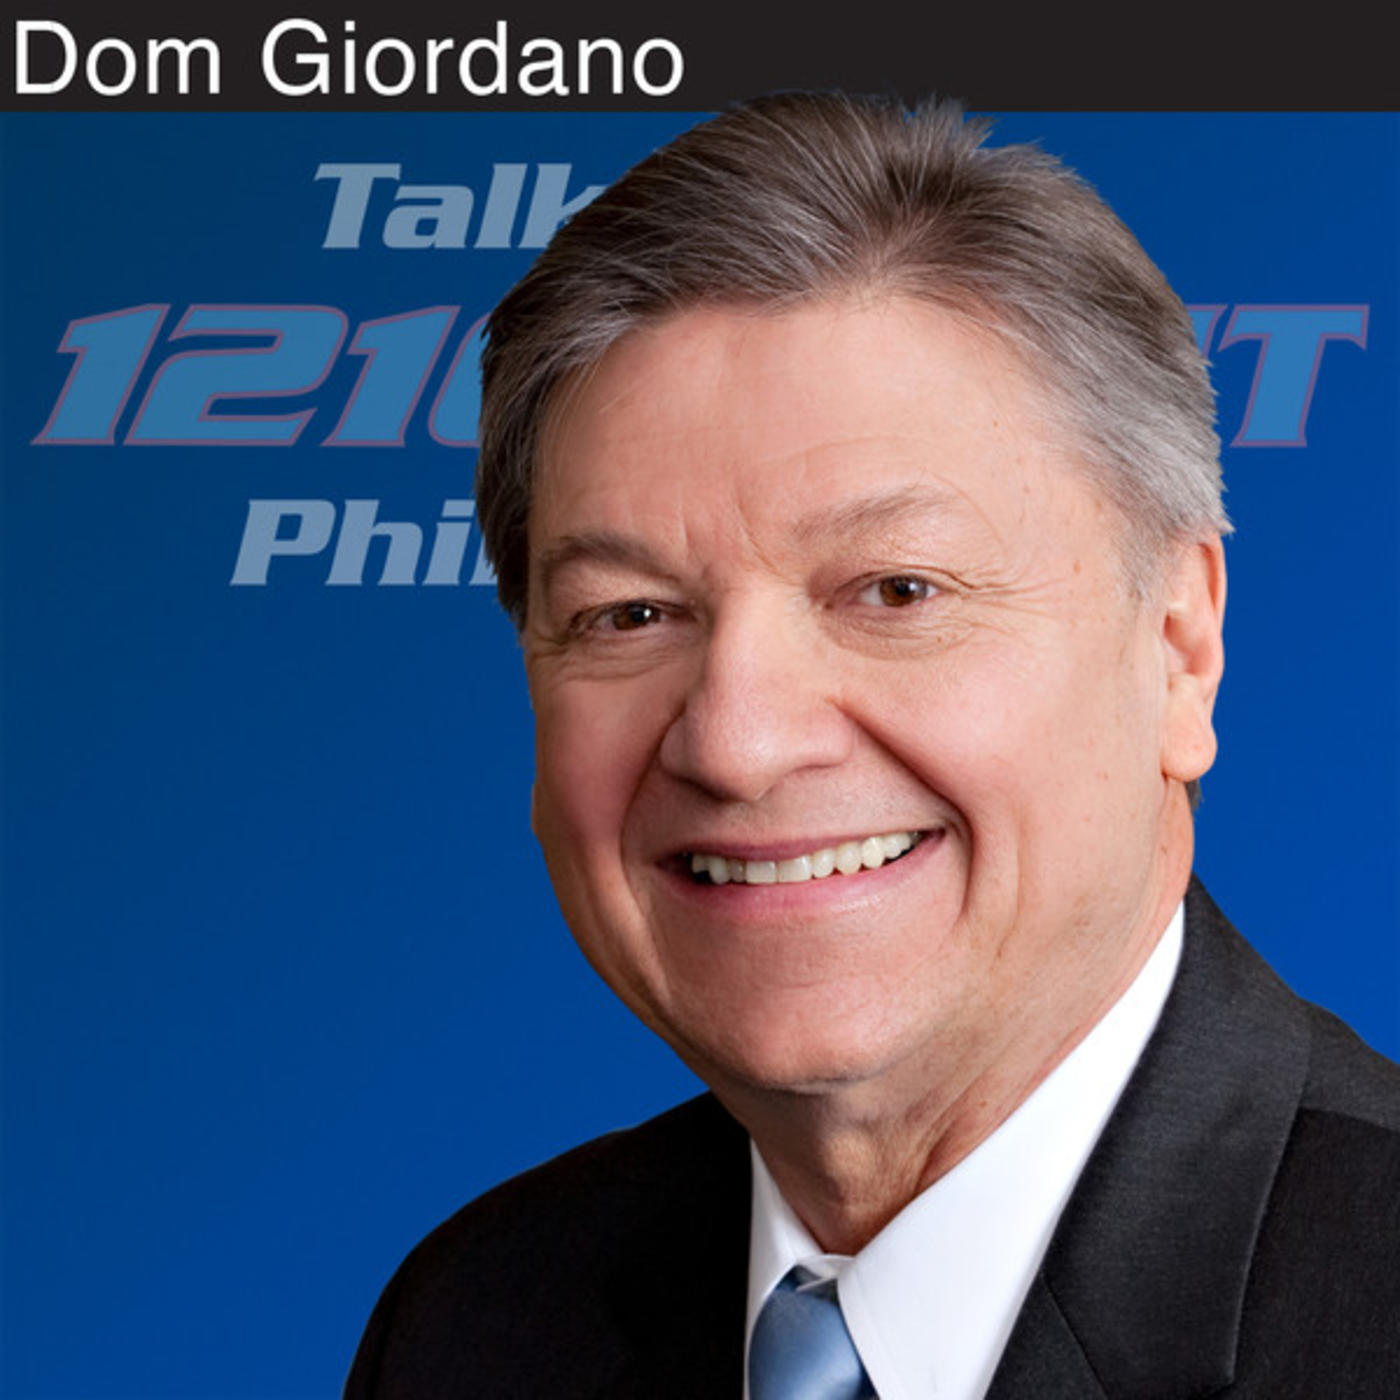 Dom Giordano Program